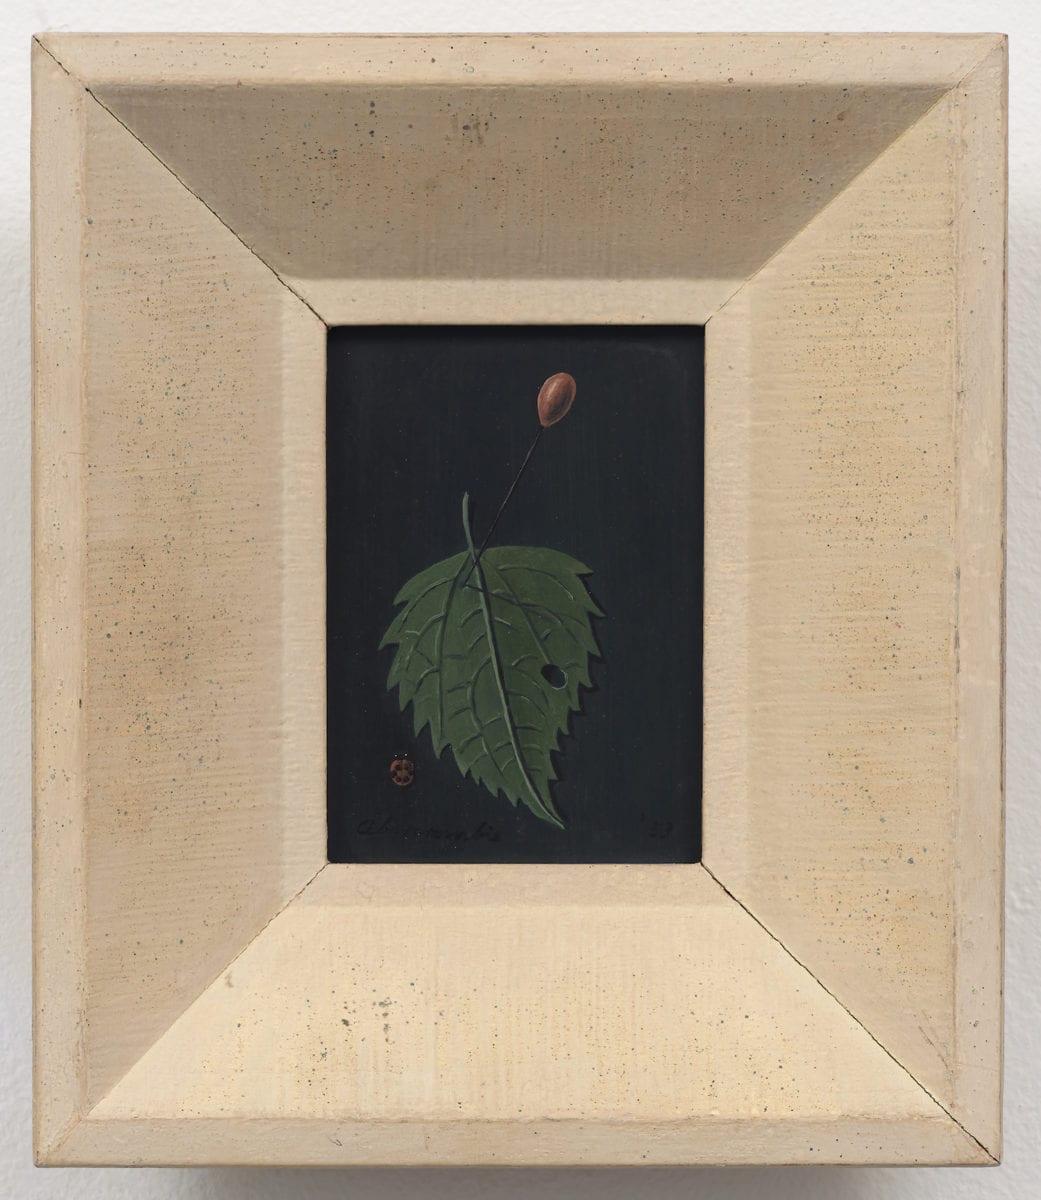 Gertrude Abercrombie, Leaf with Pin and Ladybug, 1953. Courtesy of Karma New York